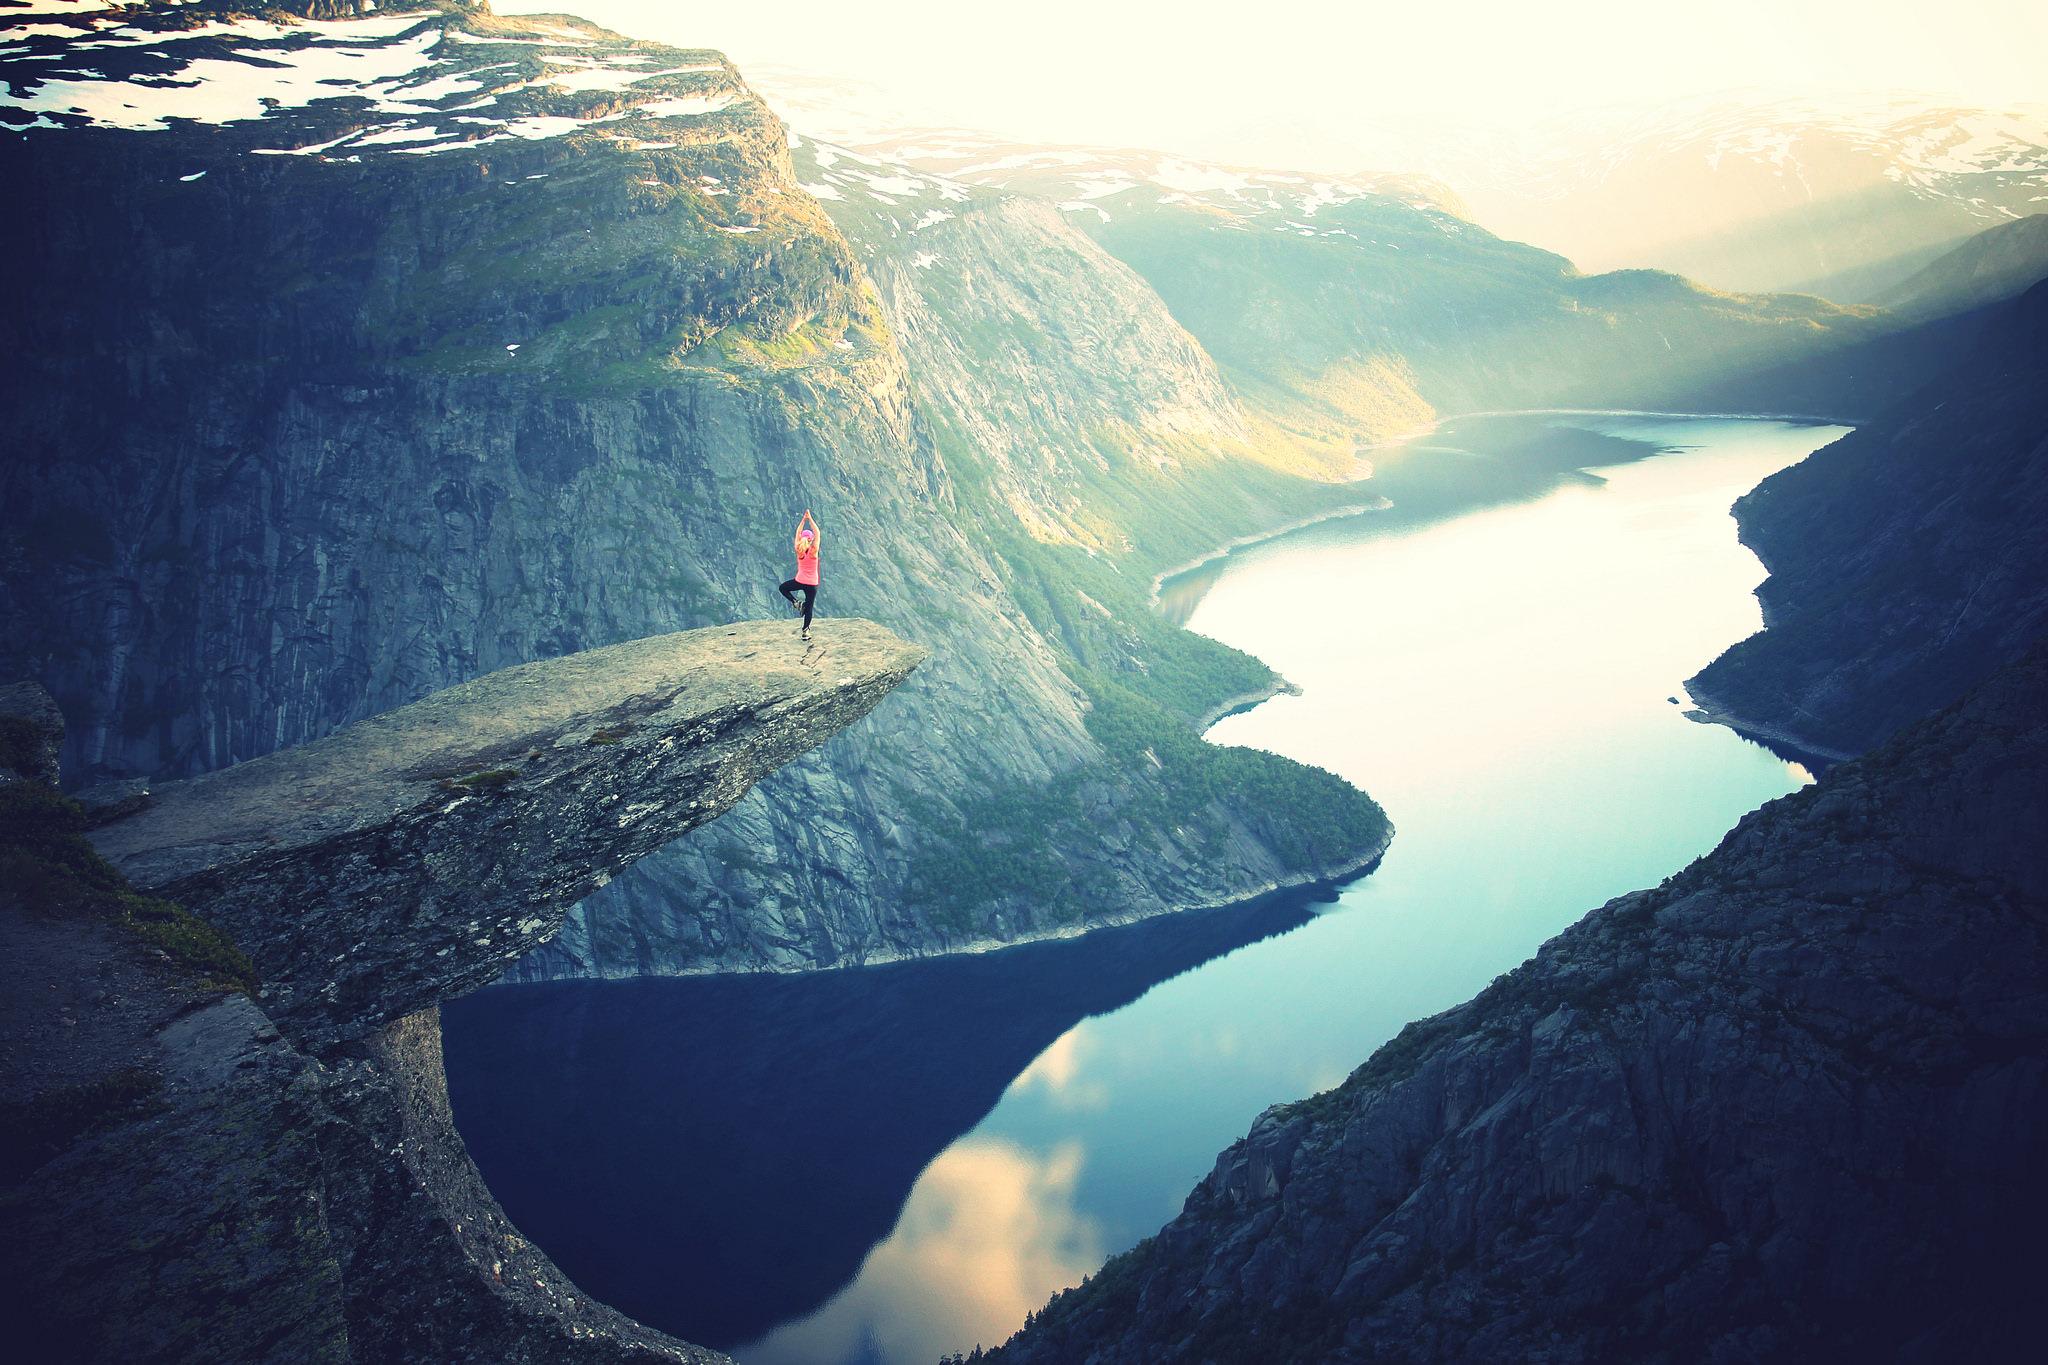 yoga on cliff.jpeg